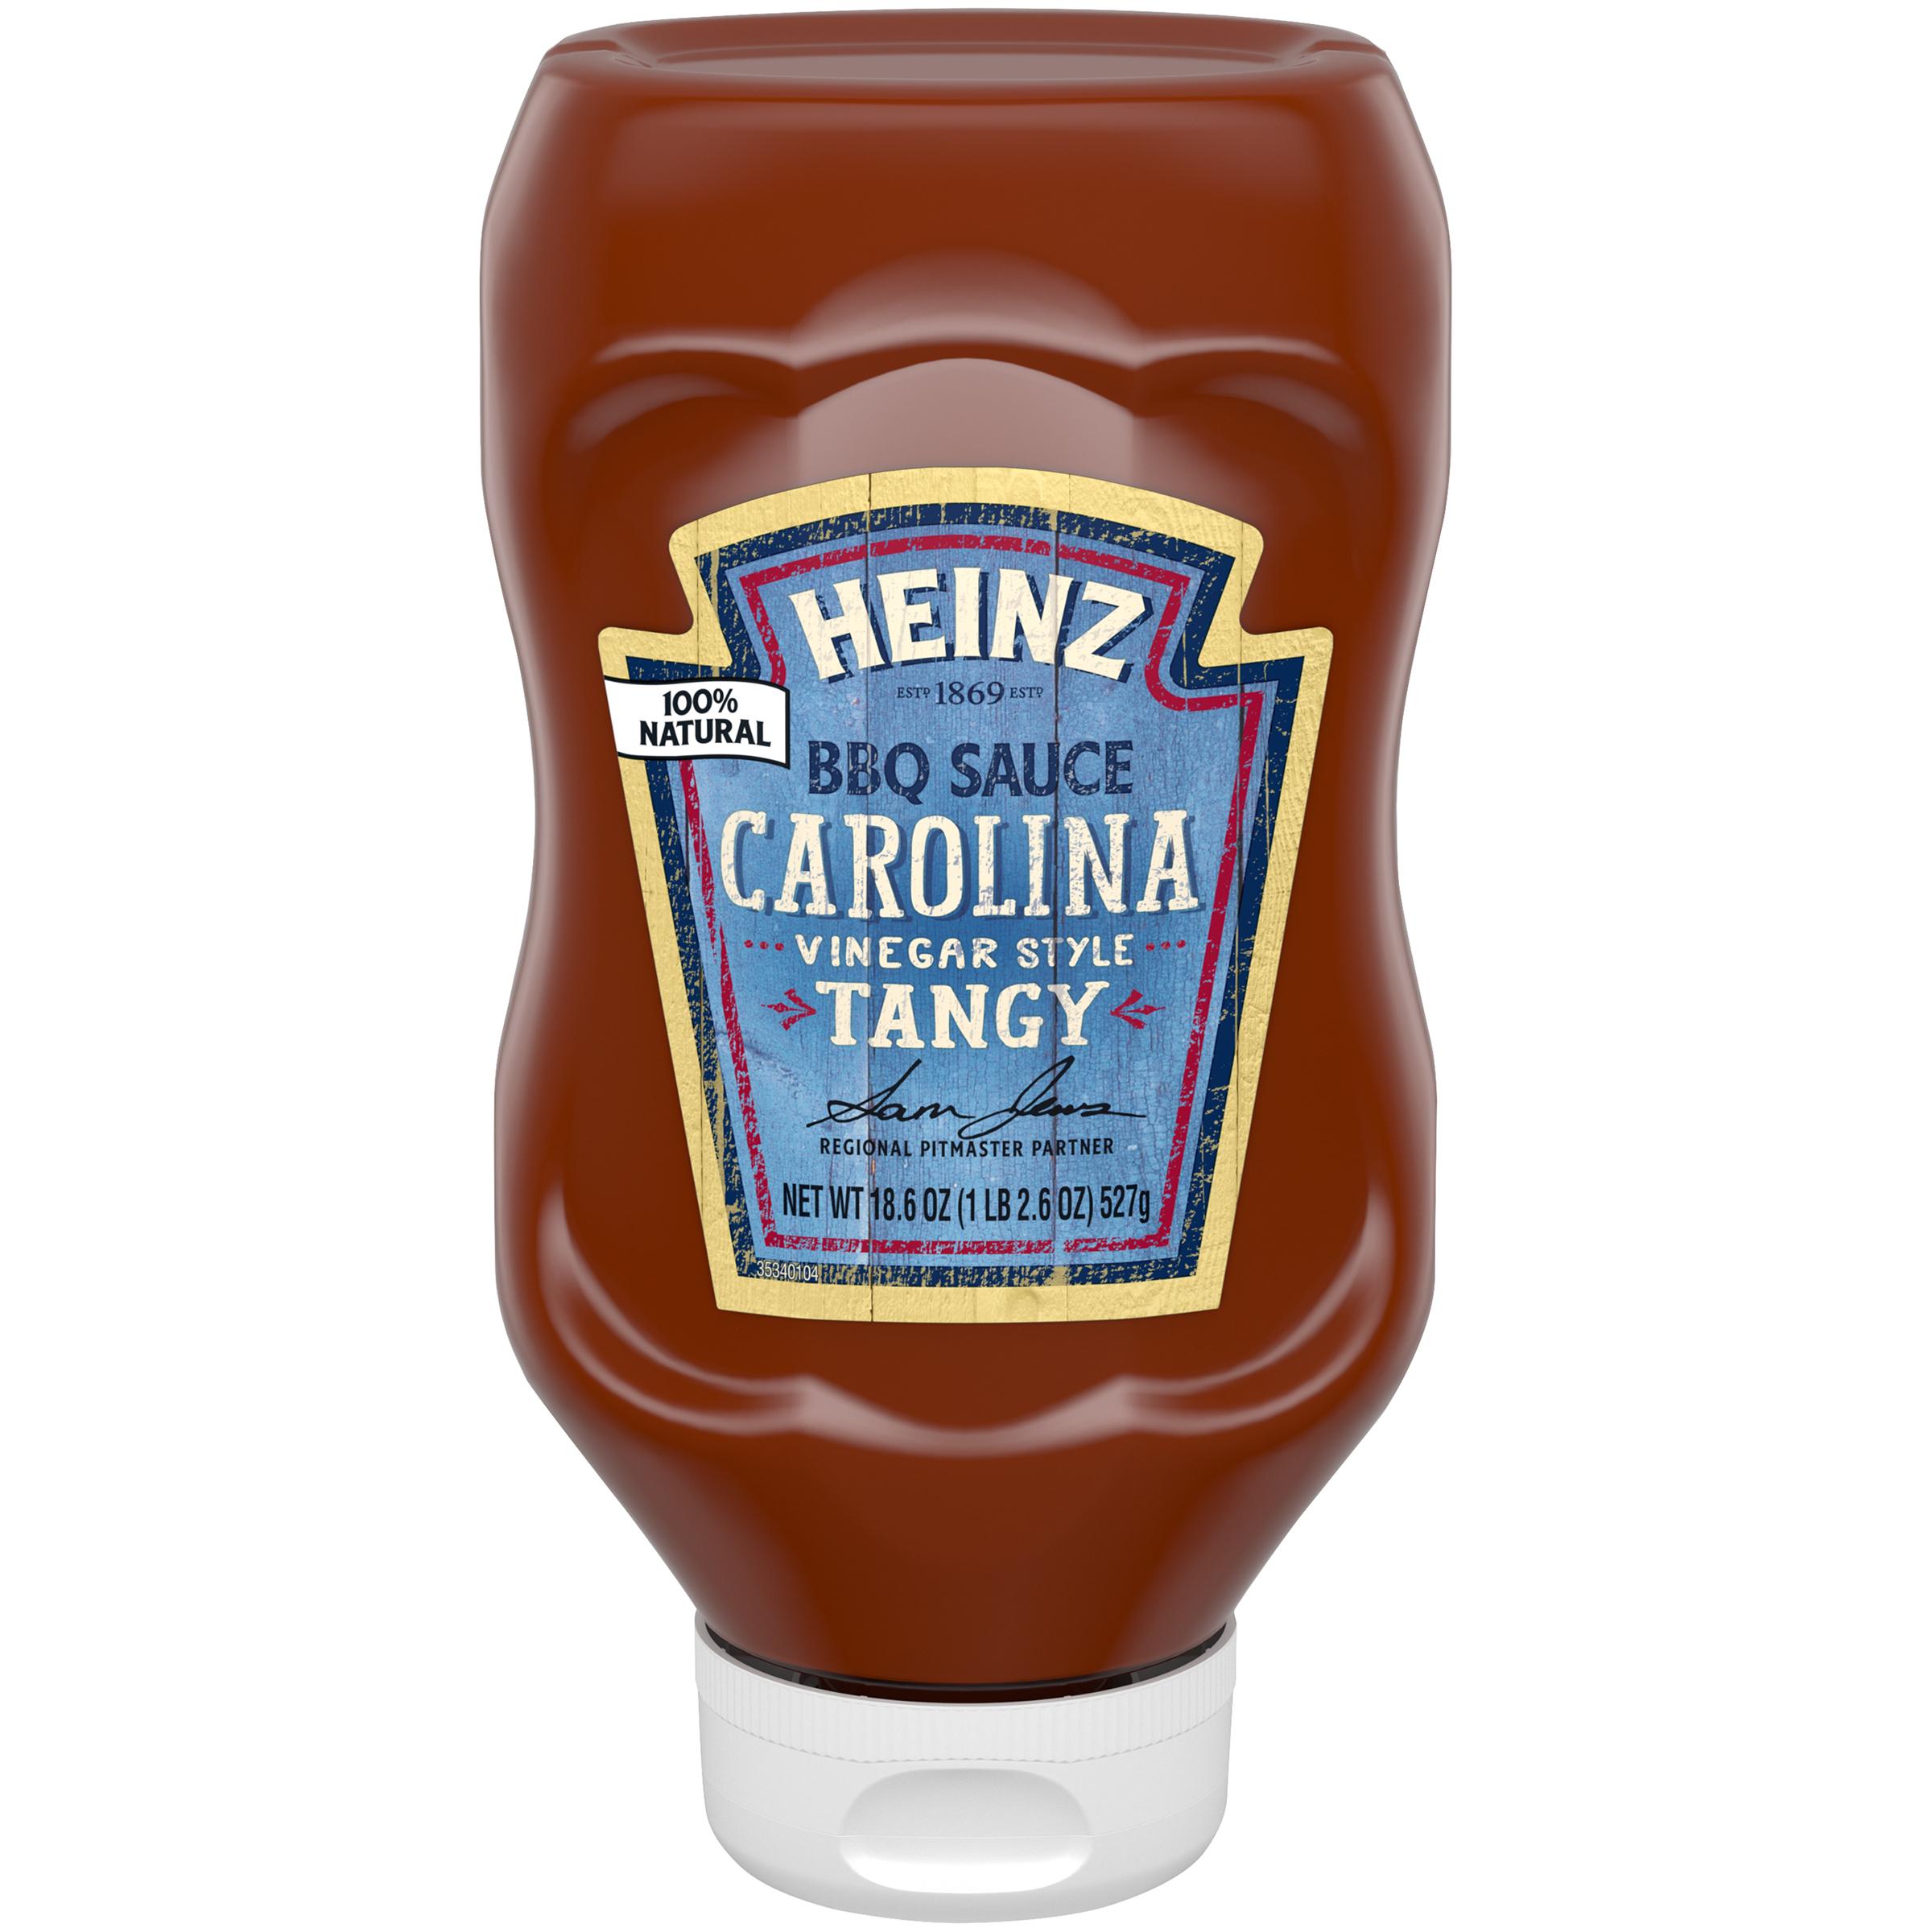 Heinz Carolina Vinegar Style Tangy BBQ Sauce 18.6 oz Bottle image